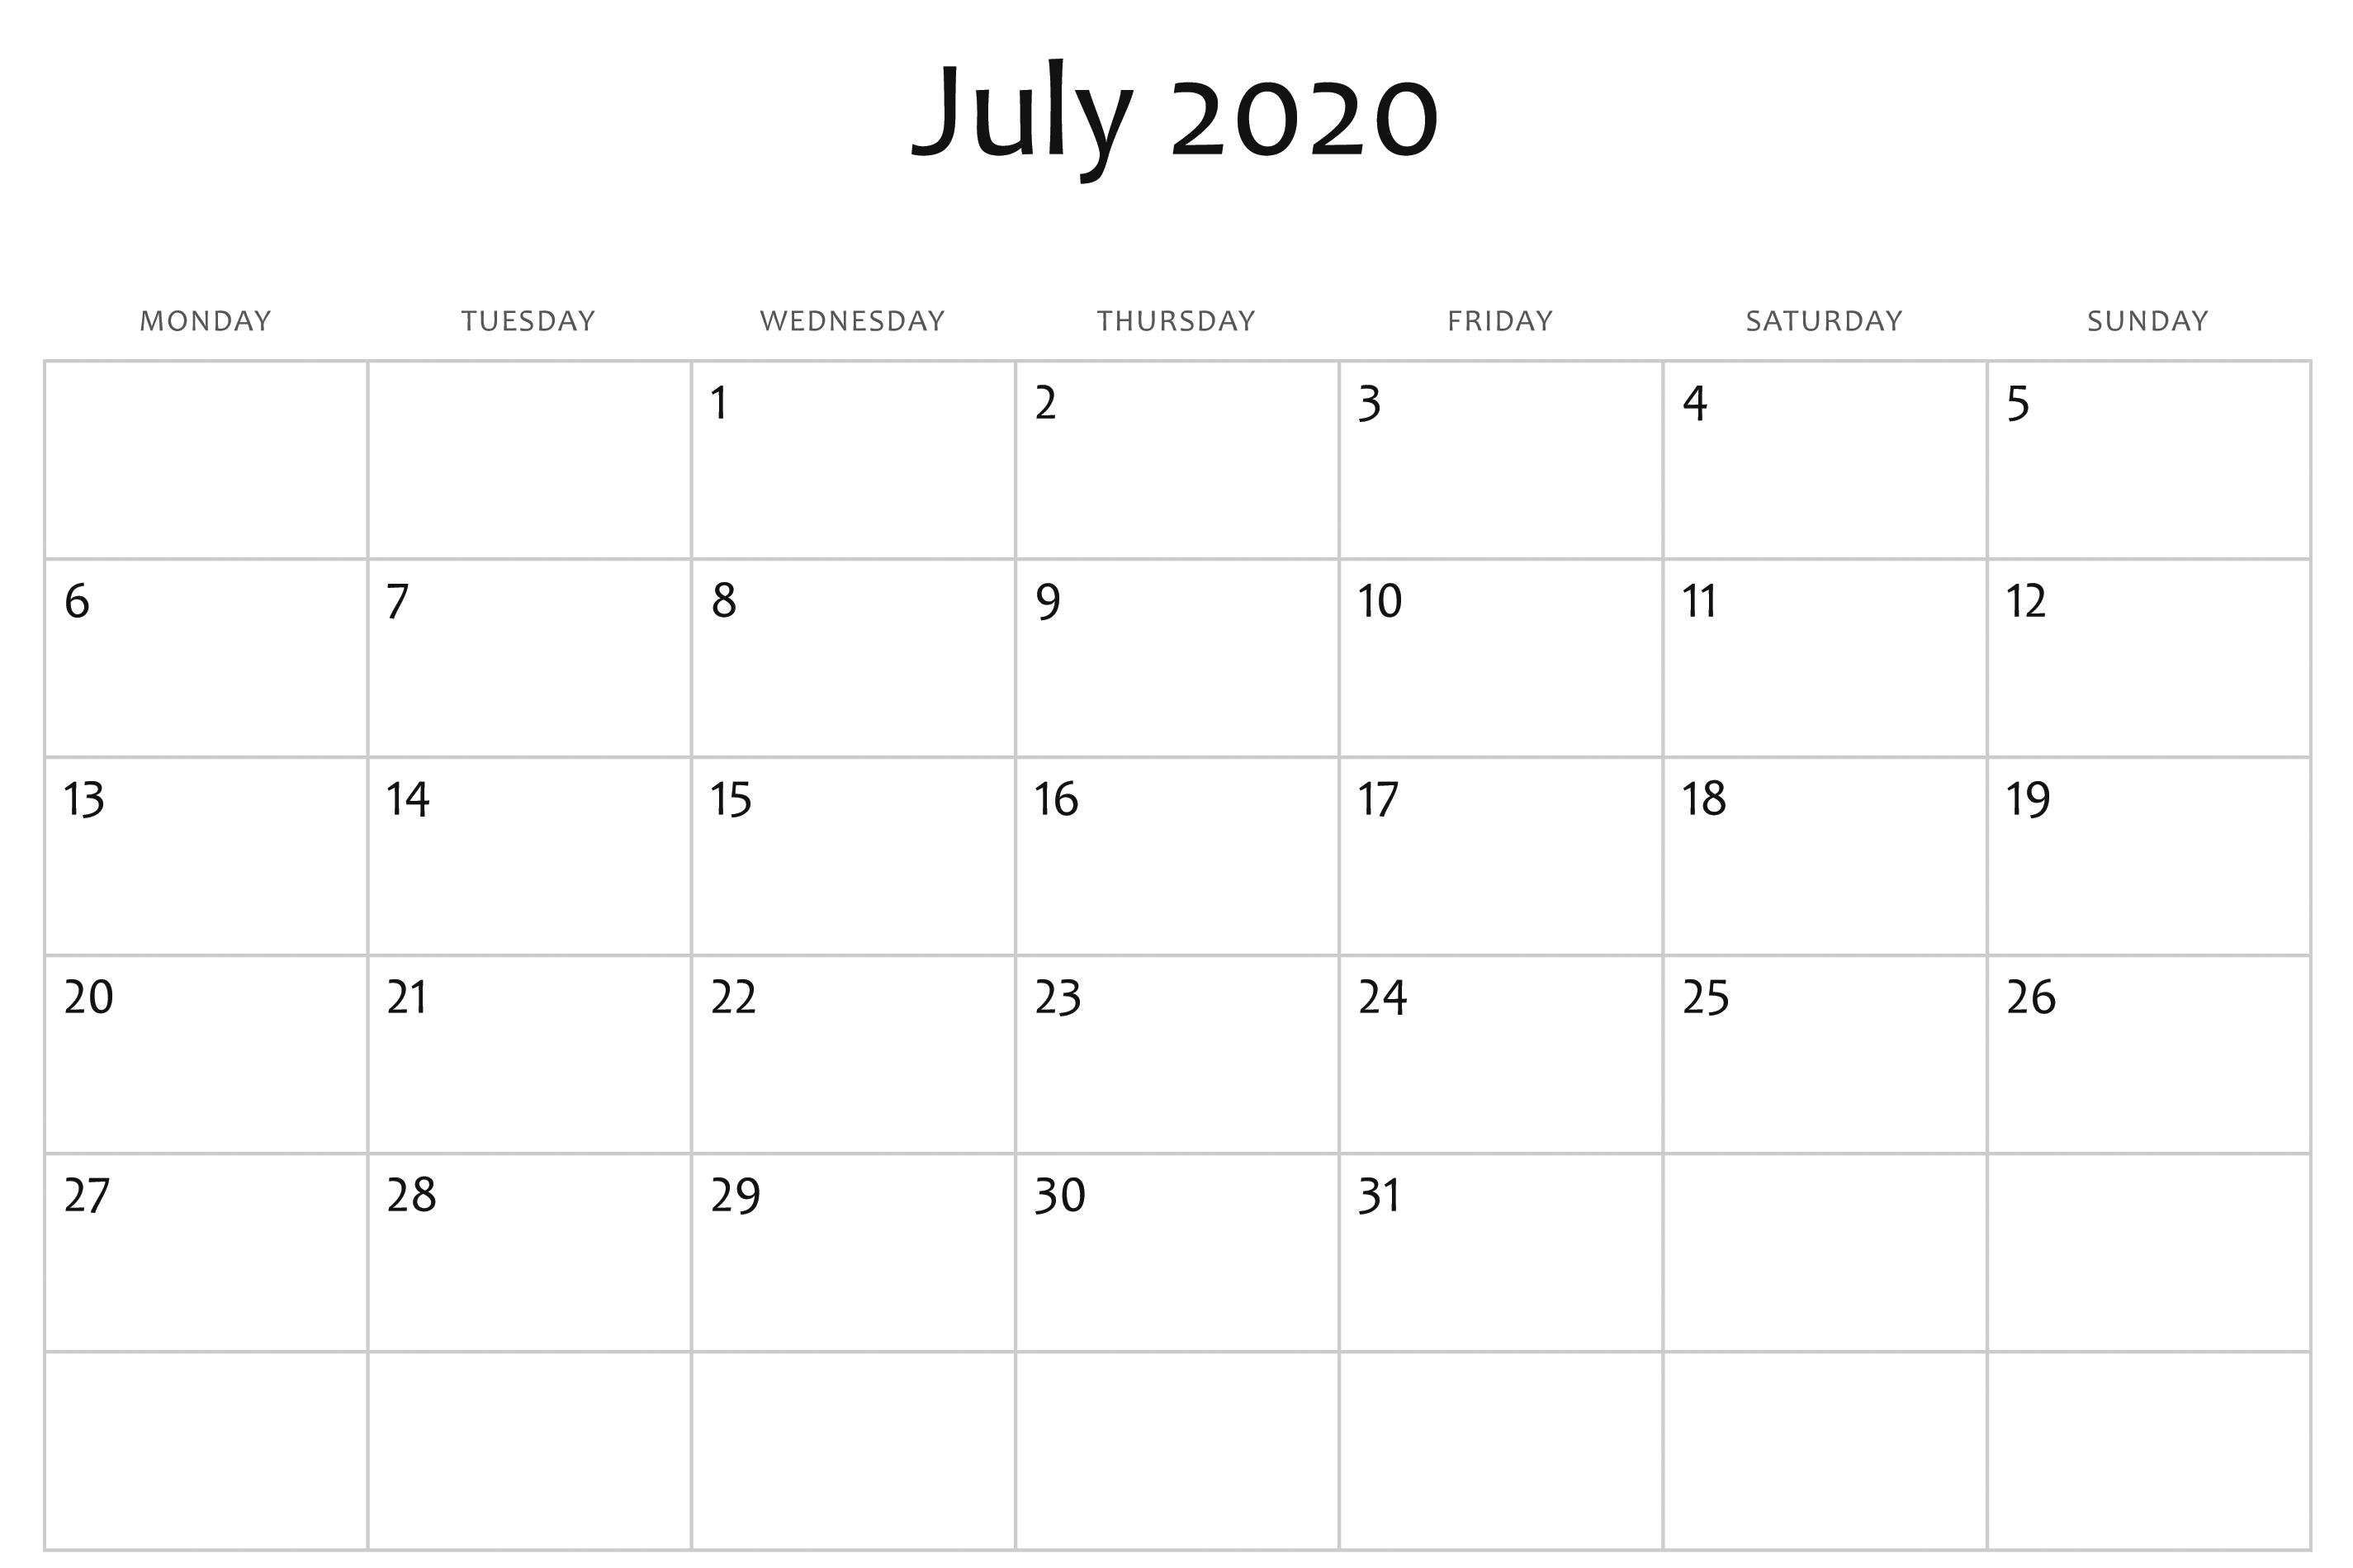 2020 Calendar Word Template - Wpa.wpart.co-Microsoft Word Template 2020 Calendar